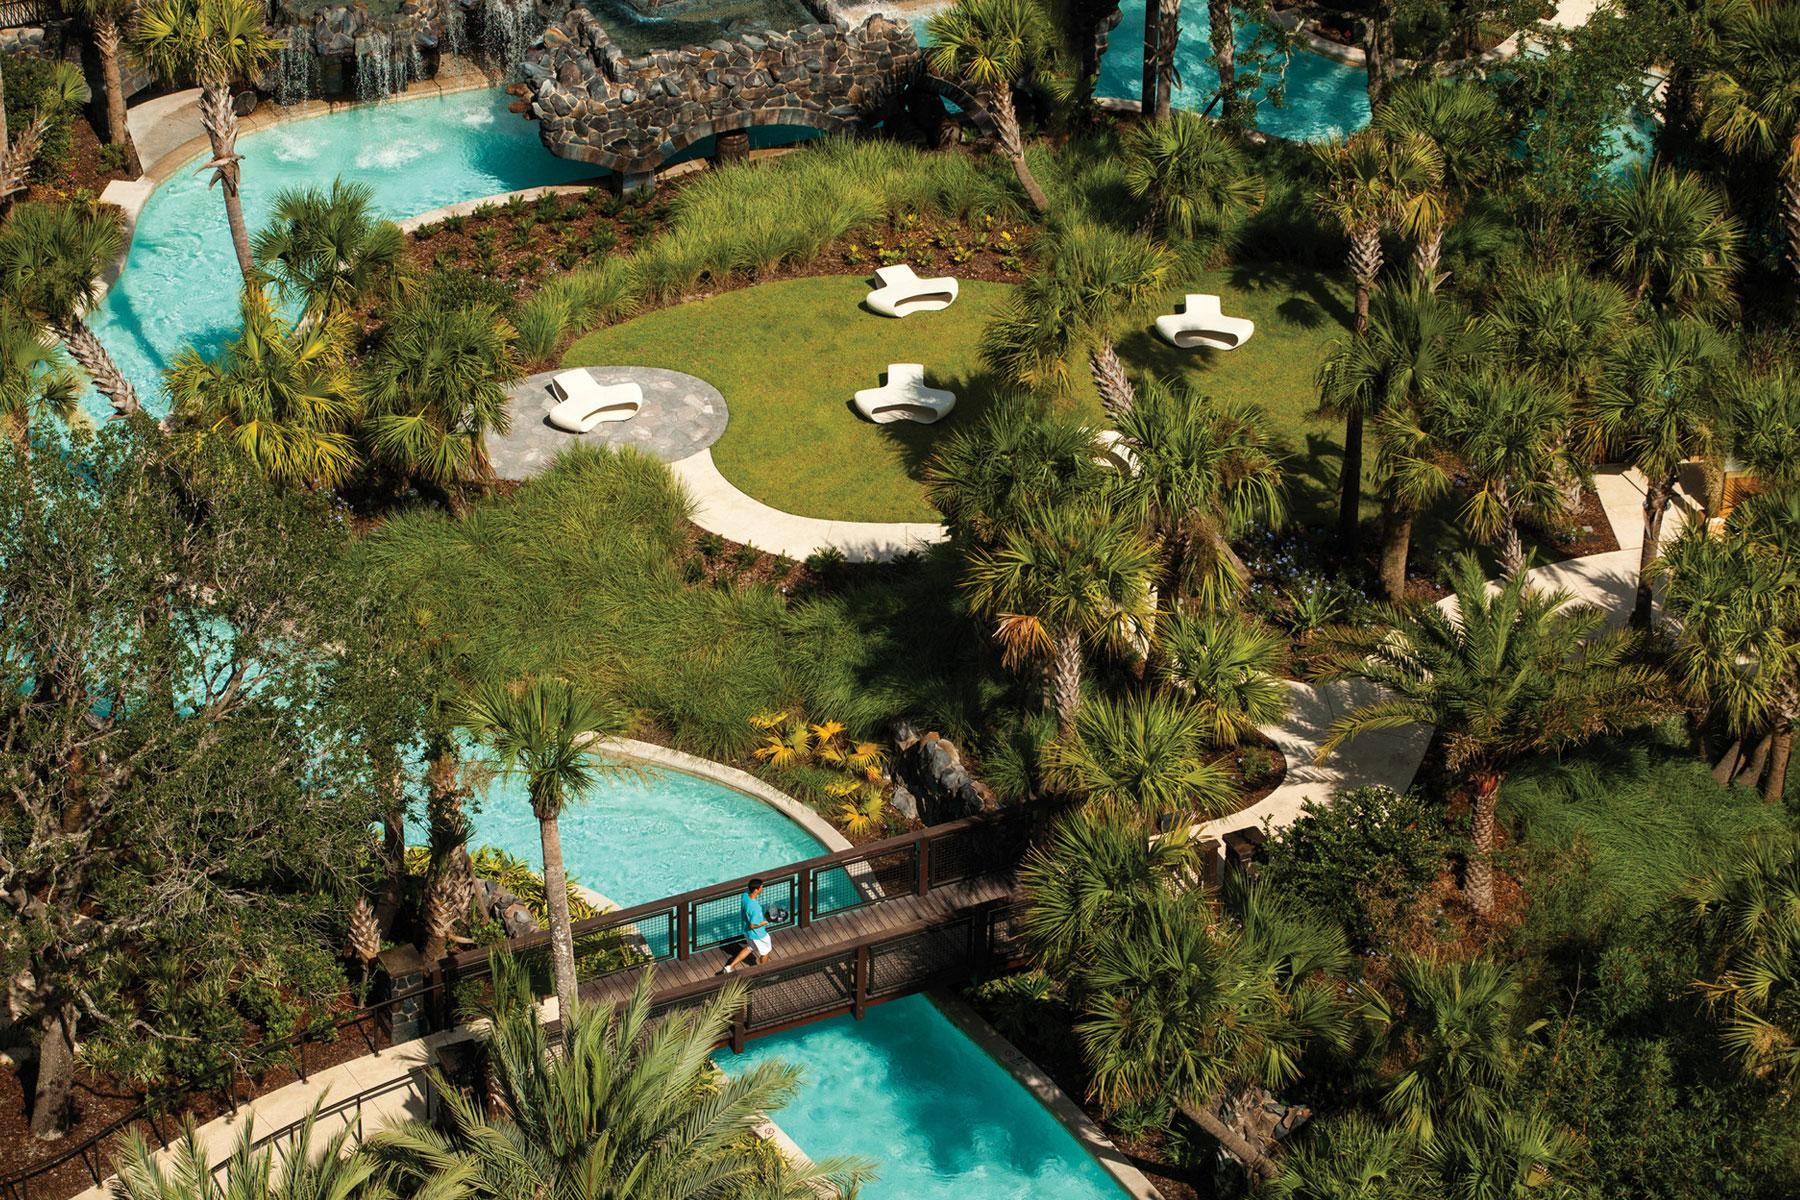 Lazy-River-Four-Seasons-Resort-Orlando